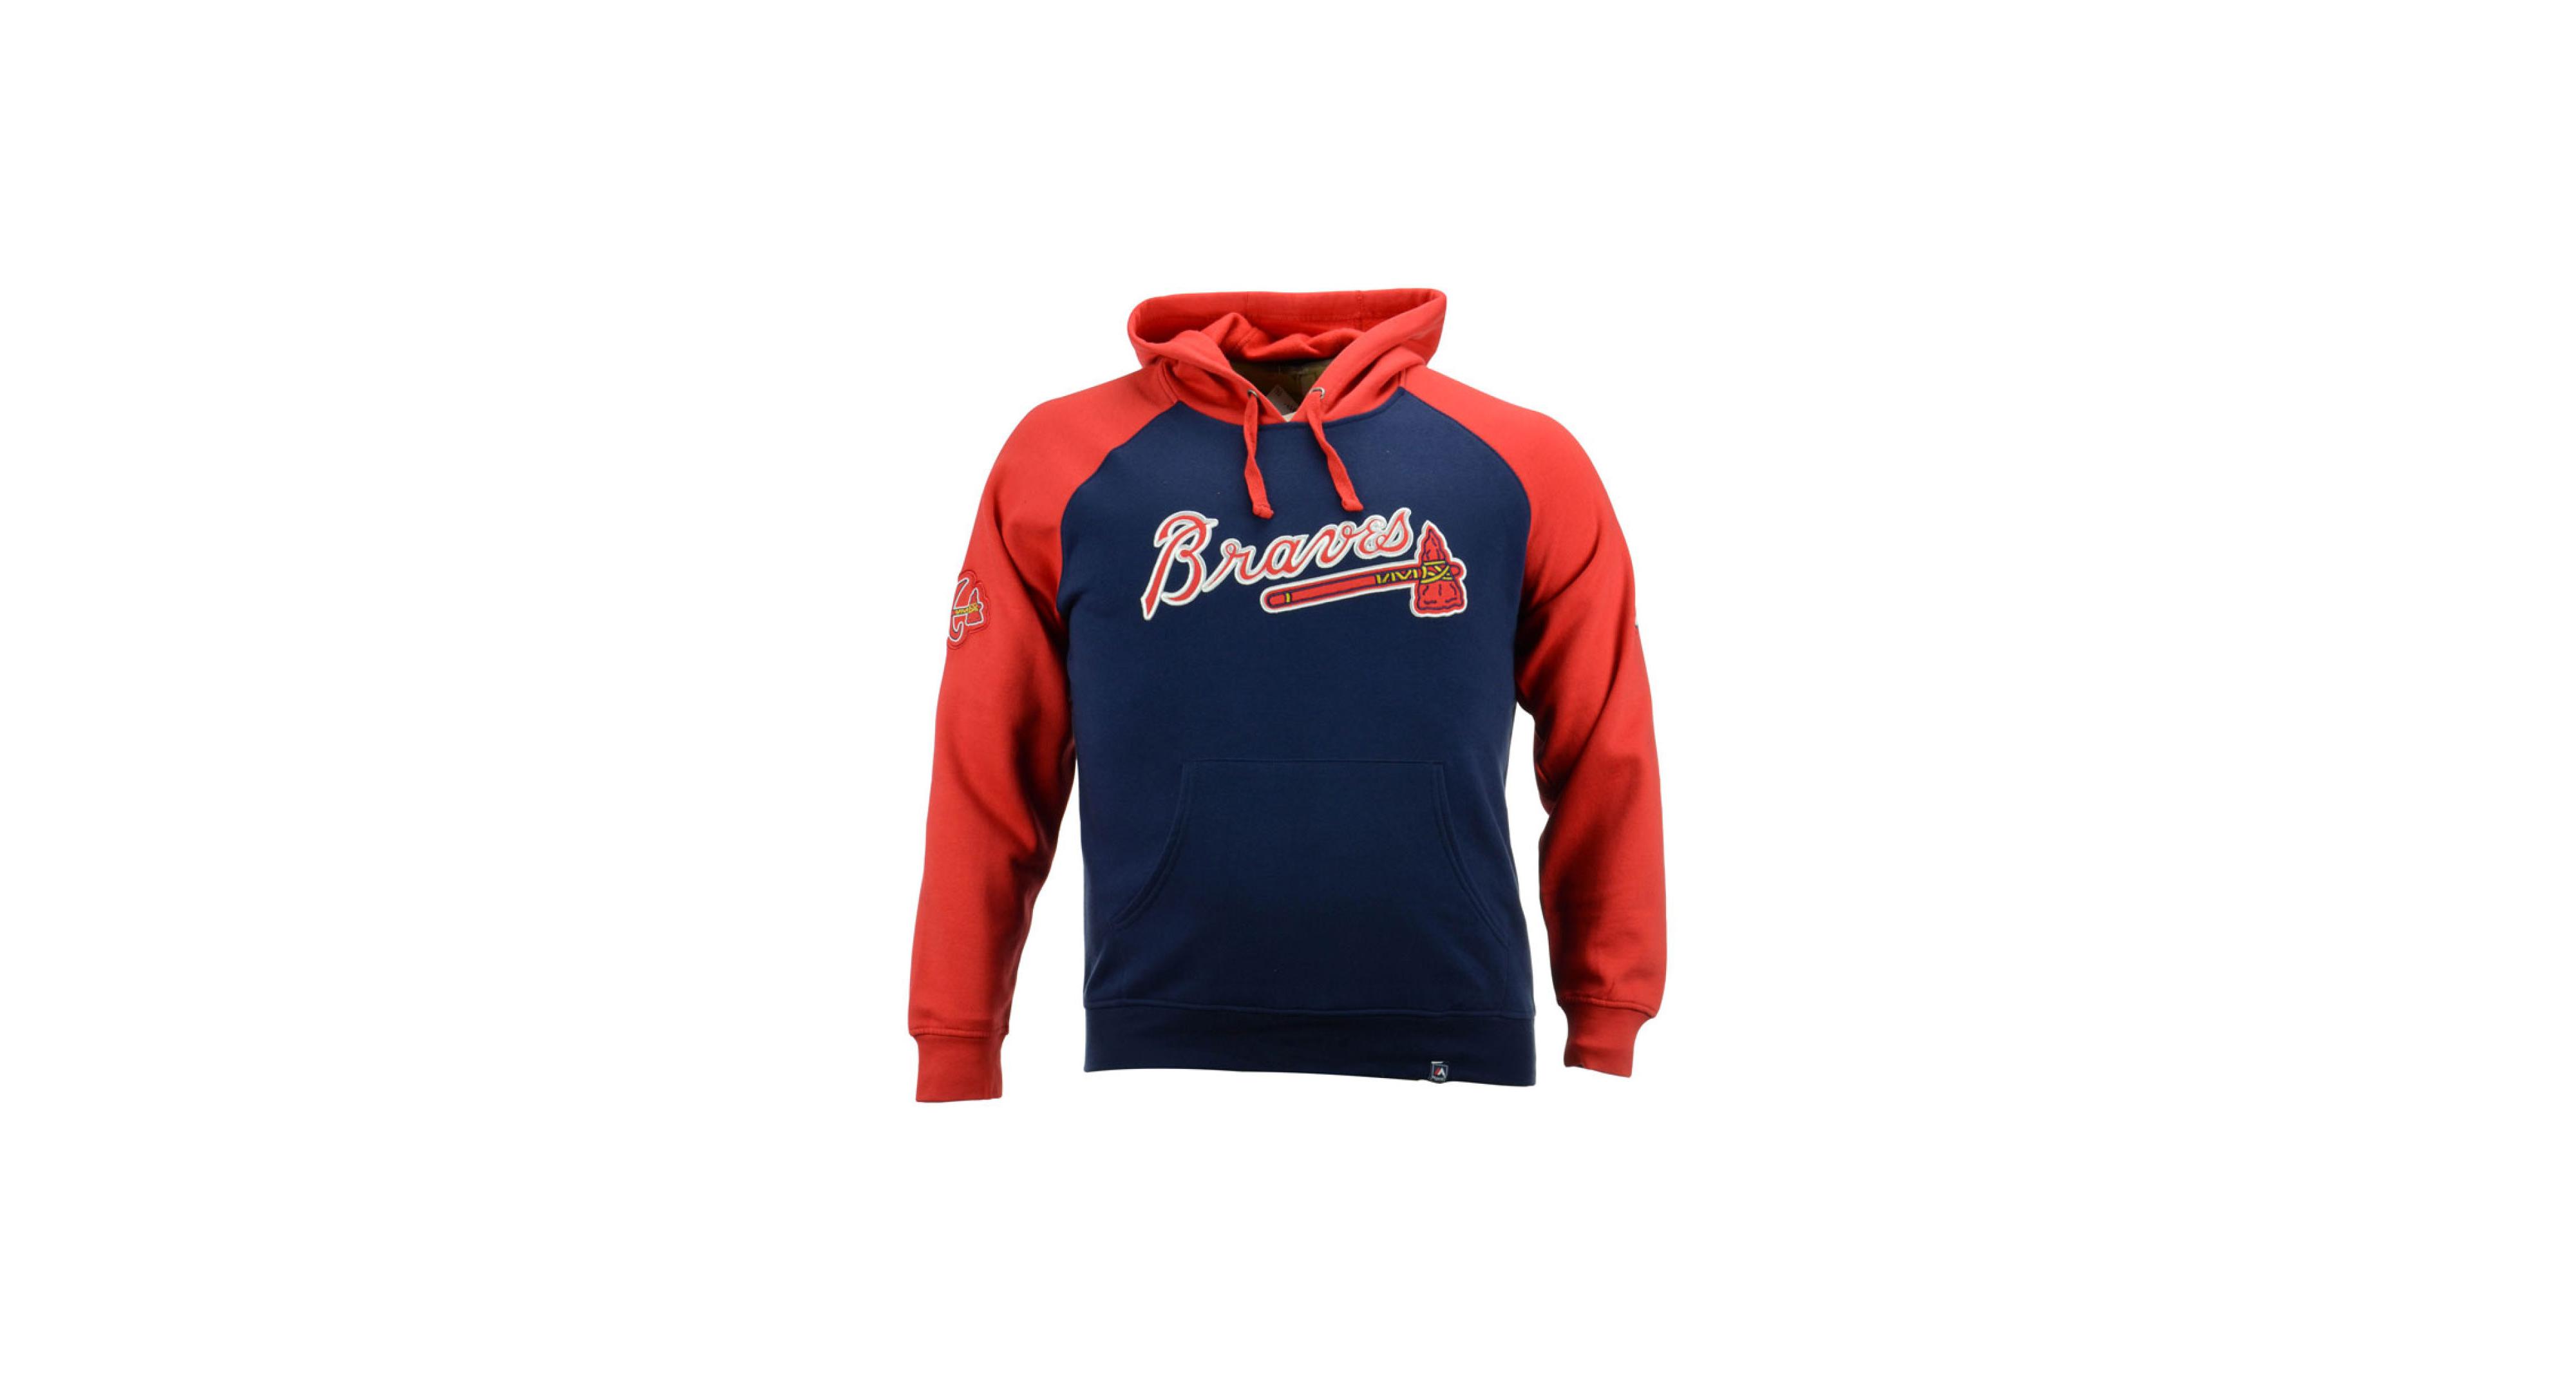 Majestic Men S Atlanta Braves Cunning Play Hoodie Products Atlanta Braves Hoodies Atlanta Braves Logo